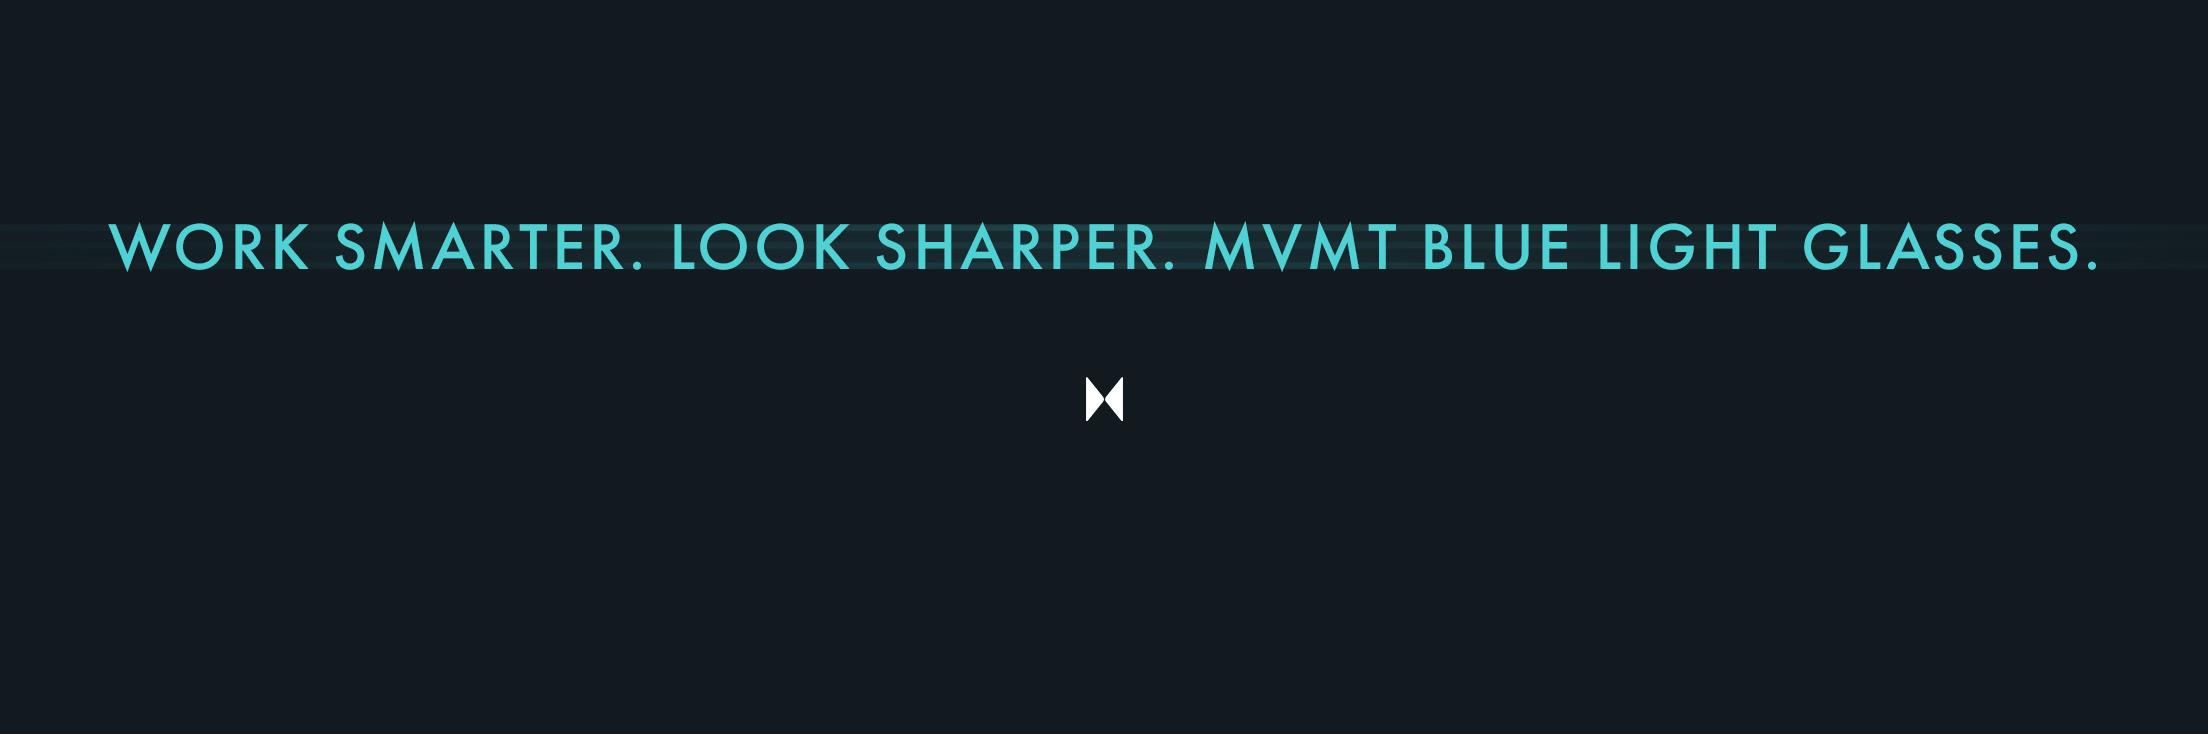 Work smarter. Look Sharper. MVMT Blue Light Glasses.